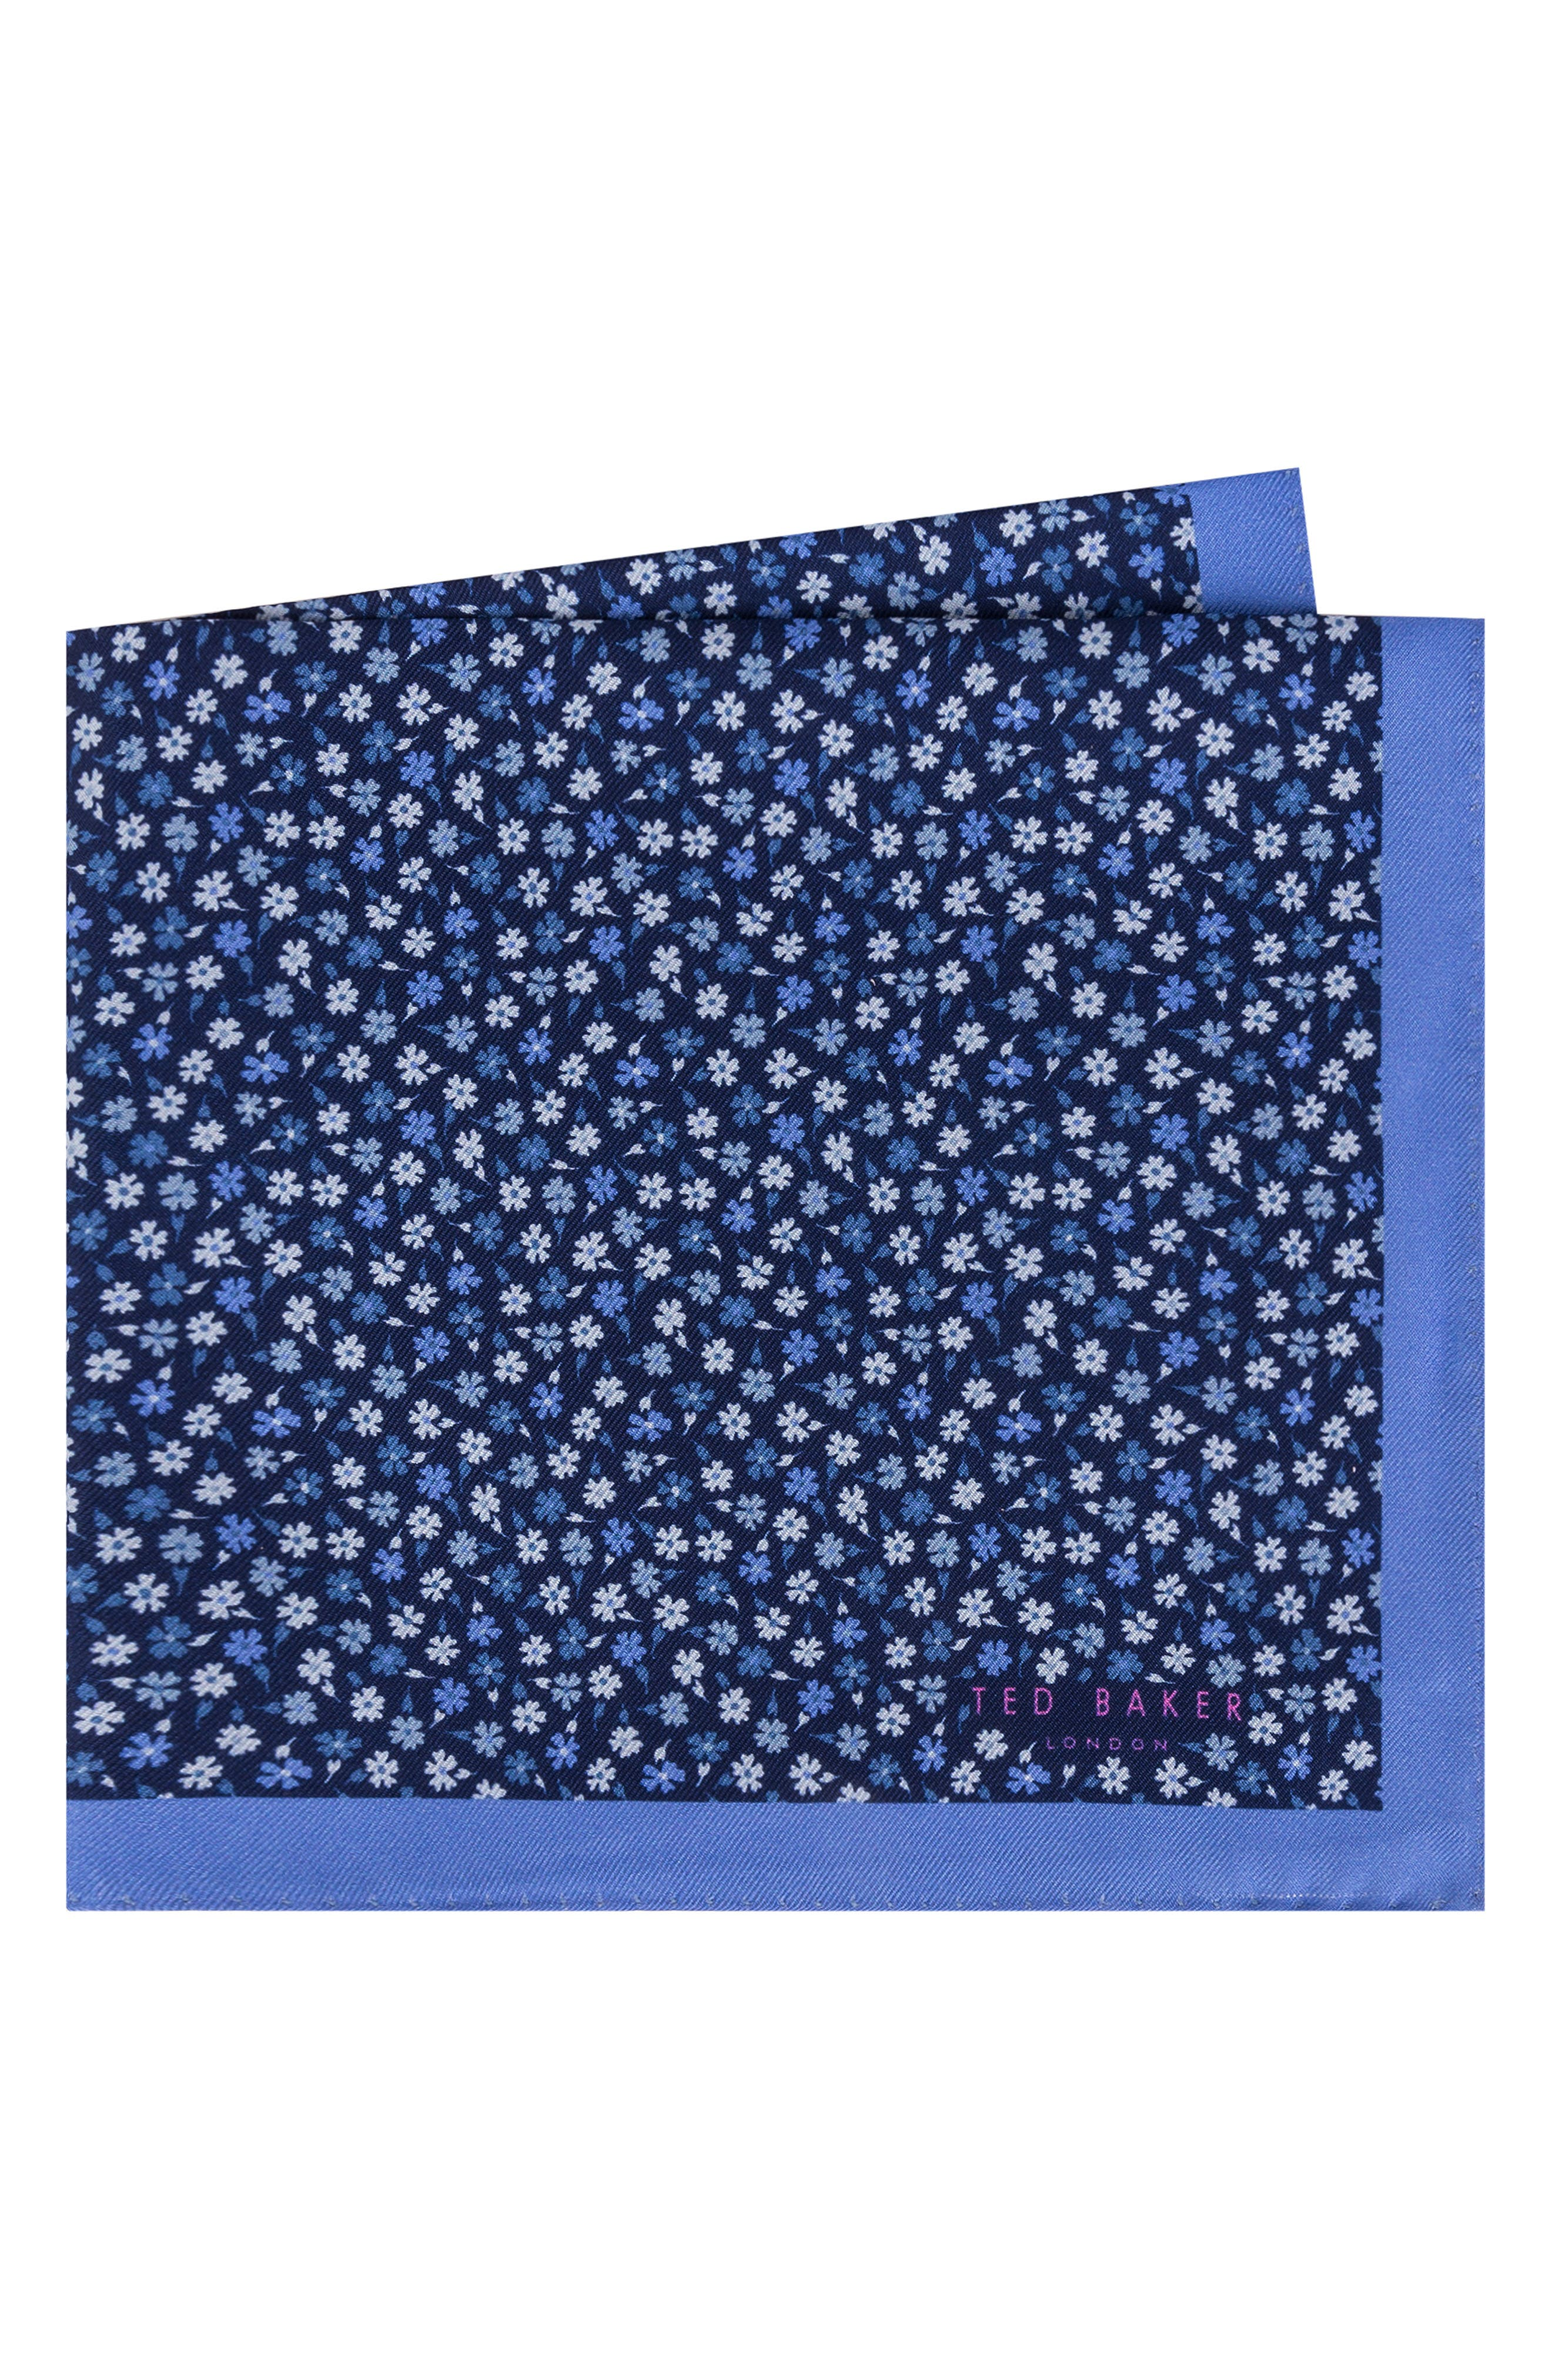 TED BAKER LONDON,                             Floral Silk Pocket Square,                             Main thumbnail 1, color,                             455